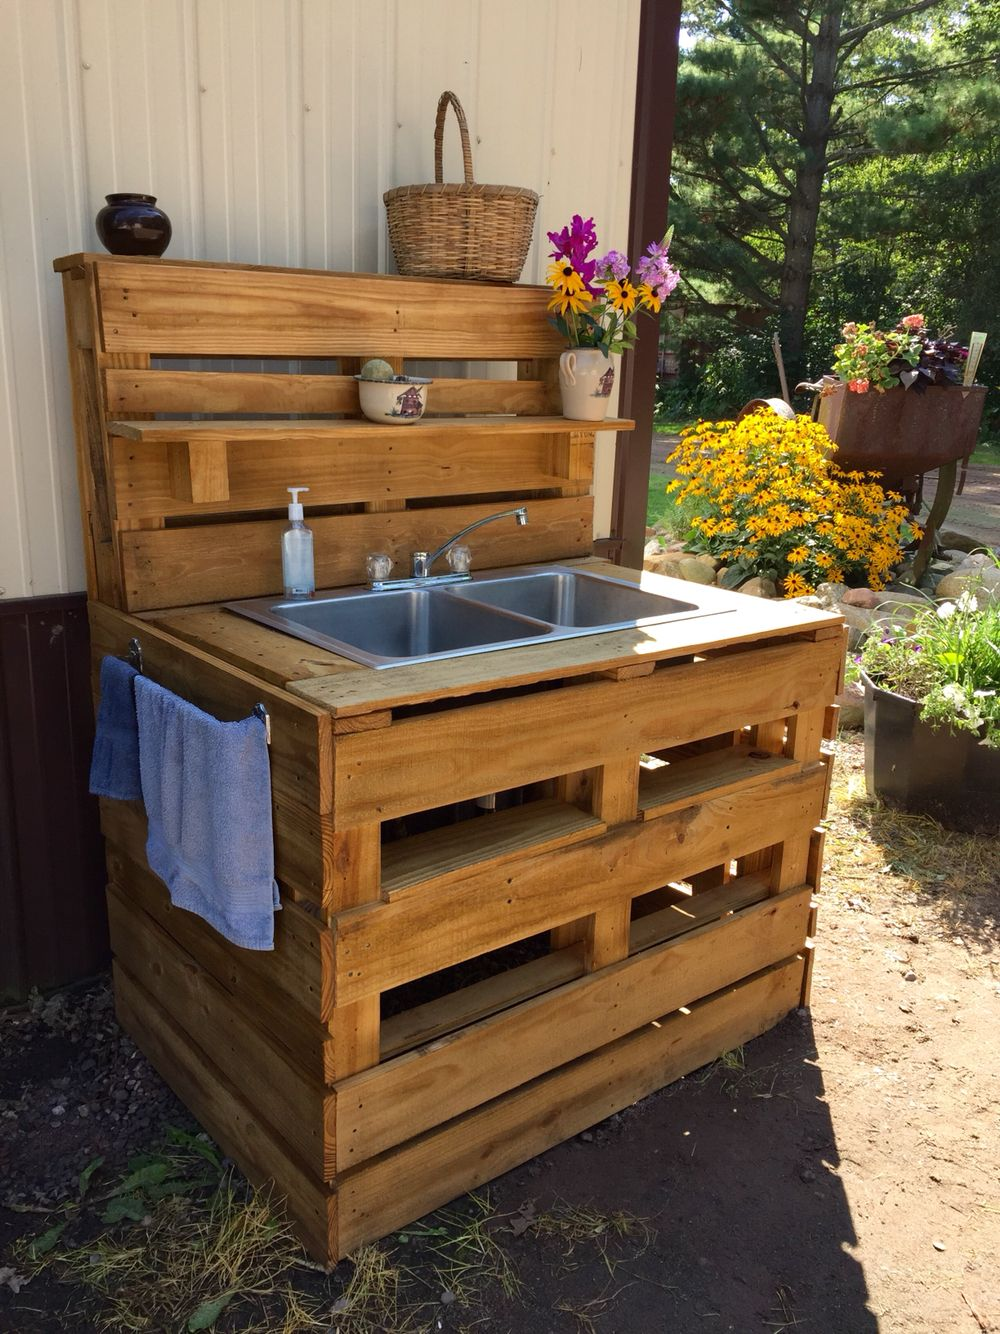 Pallet Sink Outdoors In 2019 Outdoor Sinks Backyard